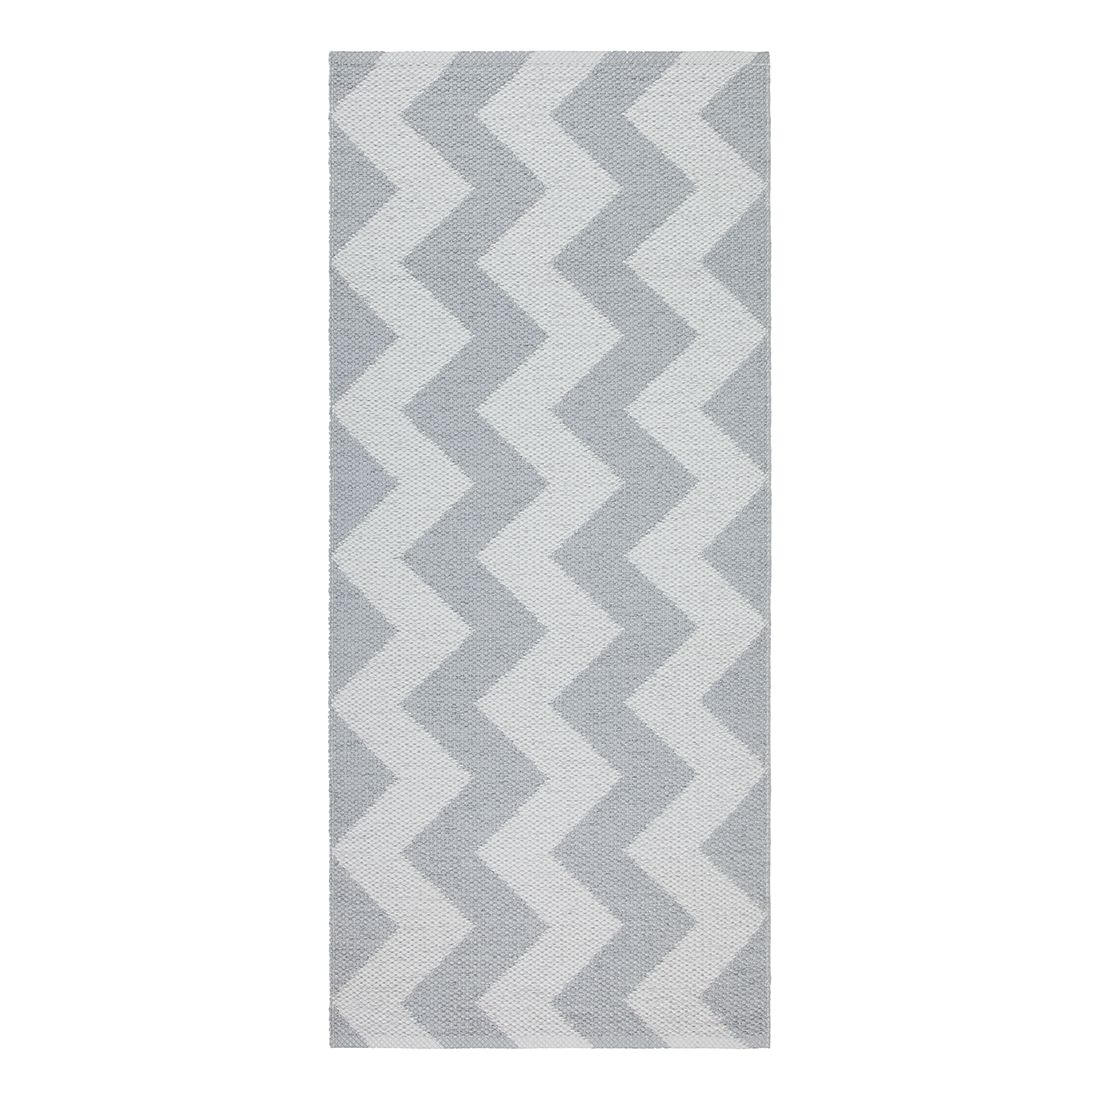 In-/Outdoorteppich Mora I – Kunstfaser Hellgrau/Grau – 60 x 120 cm, Swedy günstig kaufen